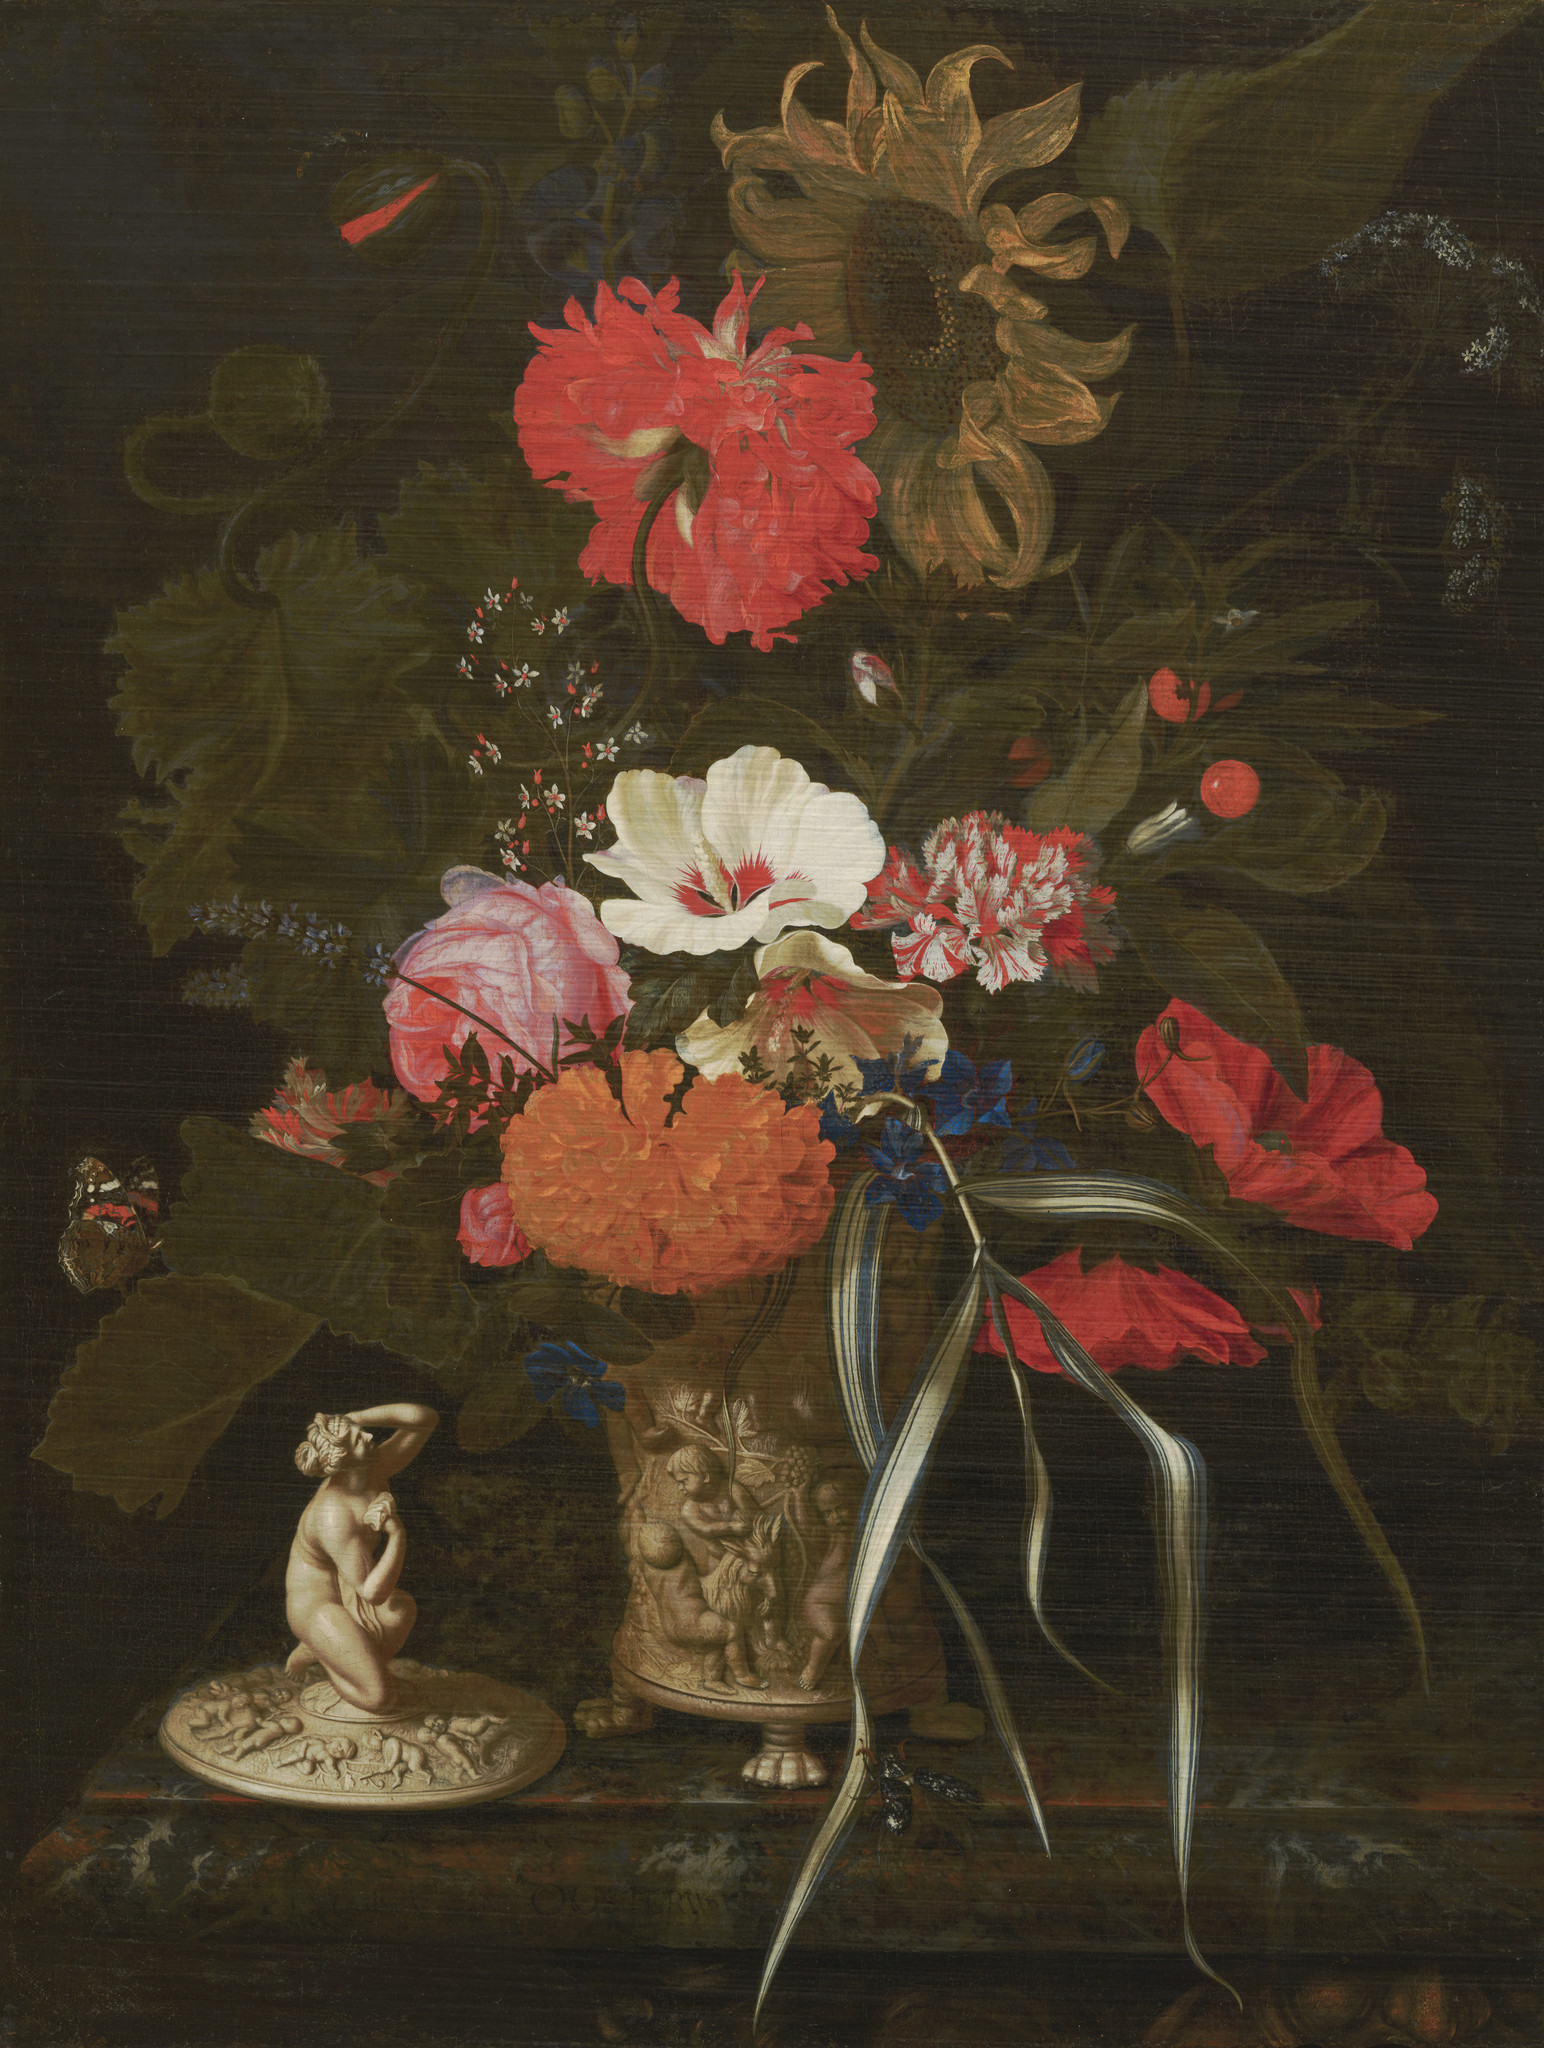 Bloemen in versierde vaas op Dibond.